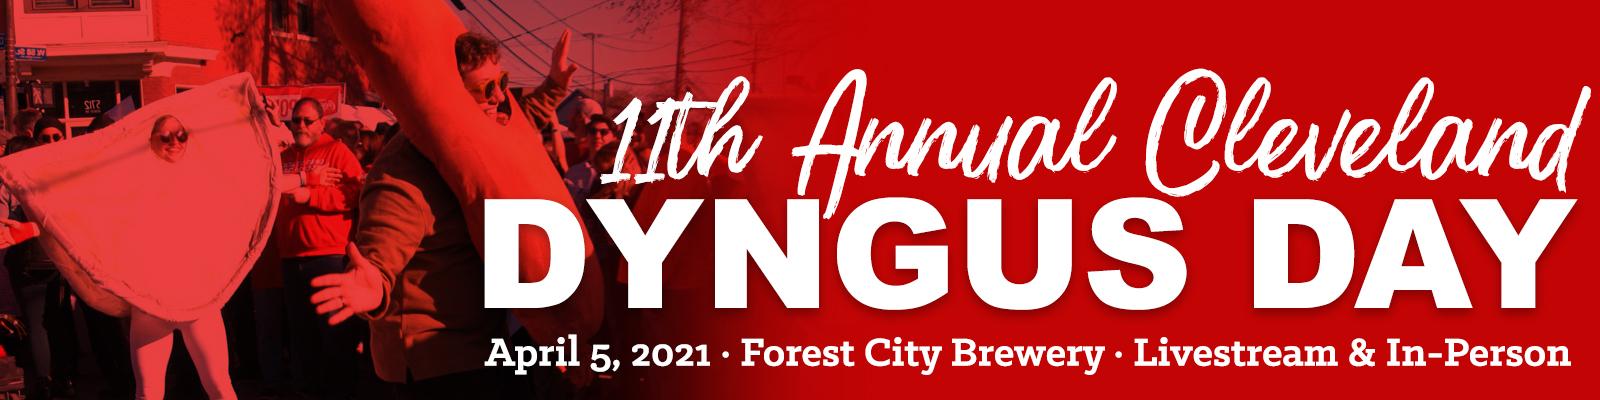 2021 Cleveland Dyngus Day banner